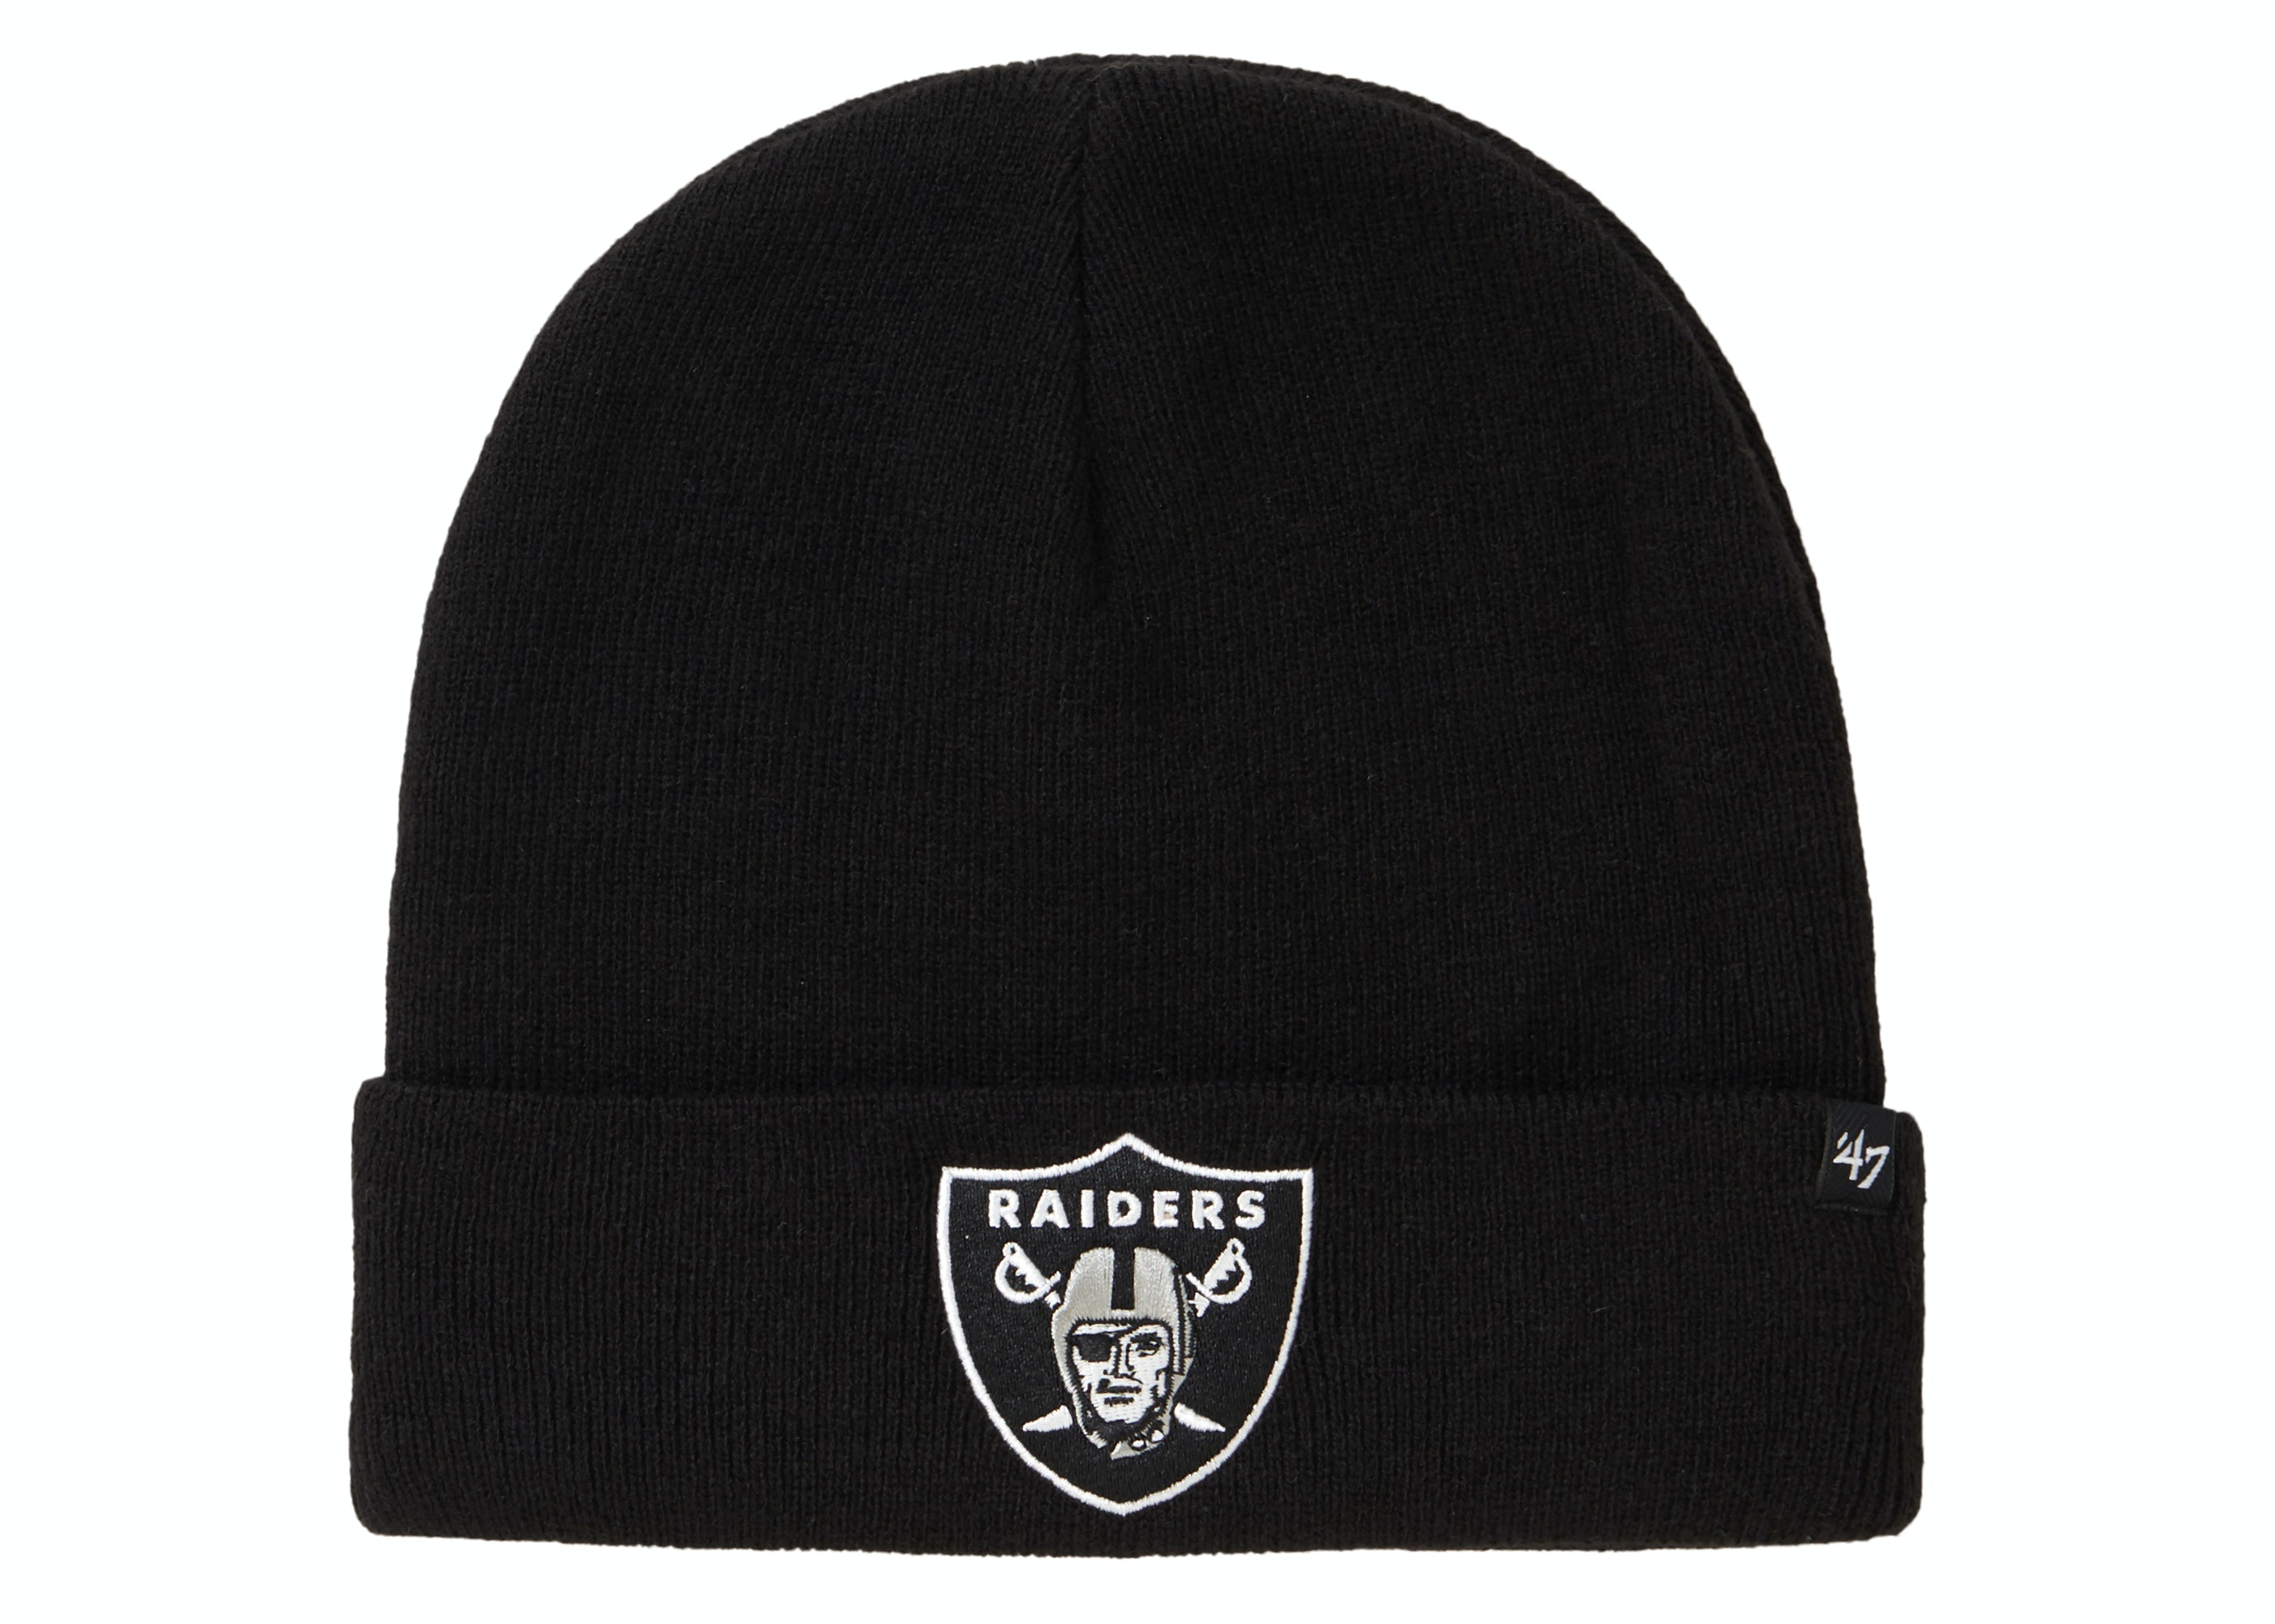 Supreme NFL x Raiders x '47 Beanie Black